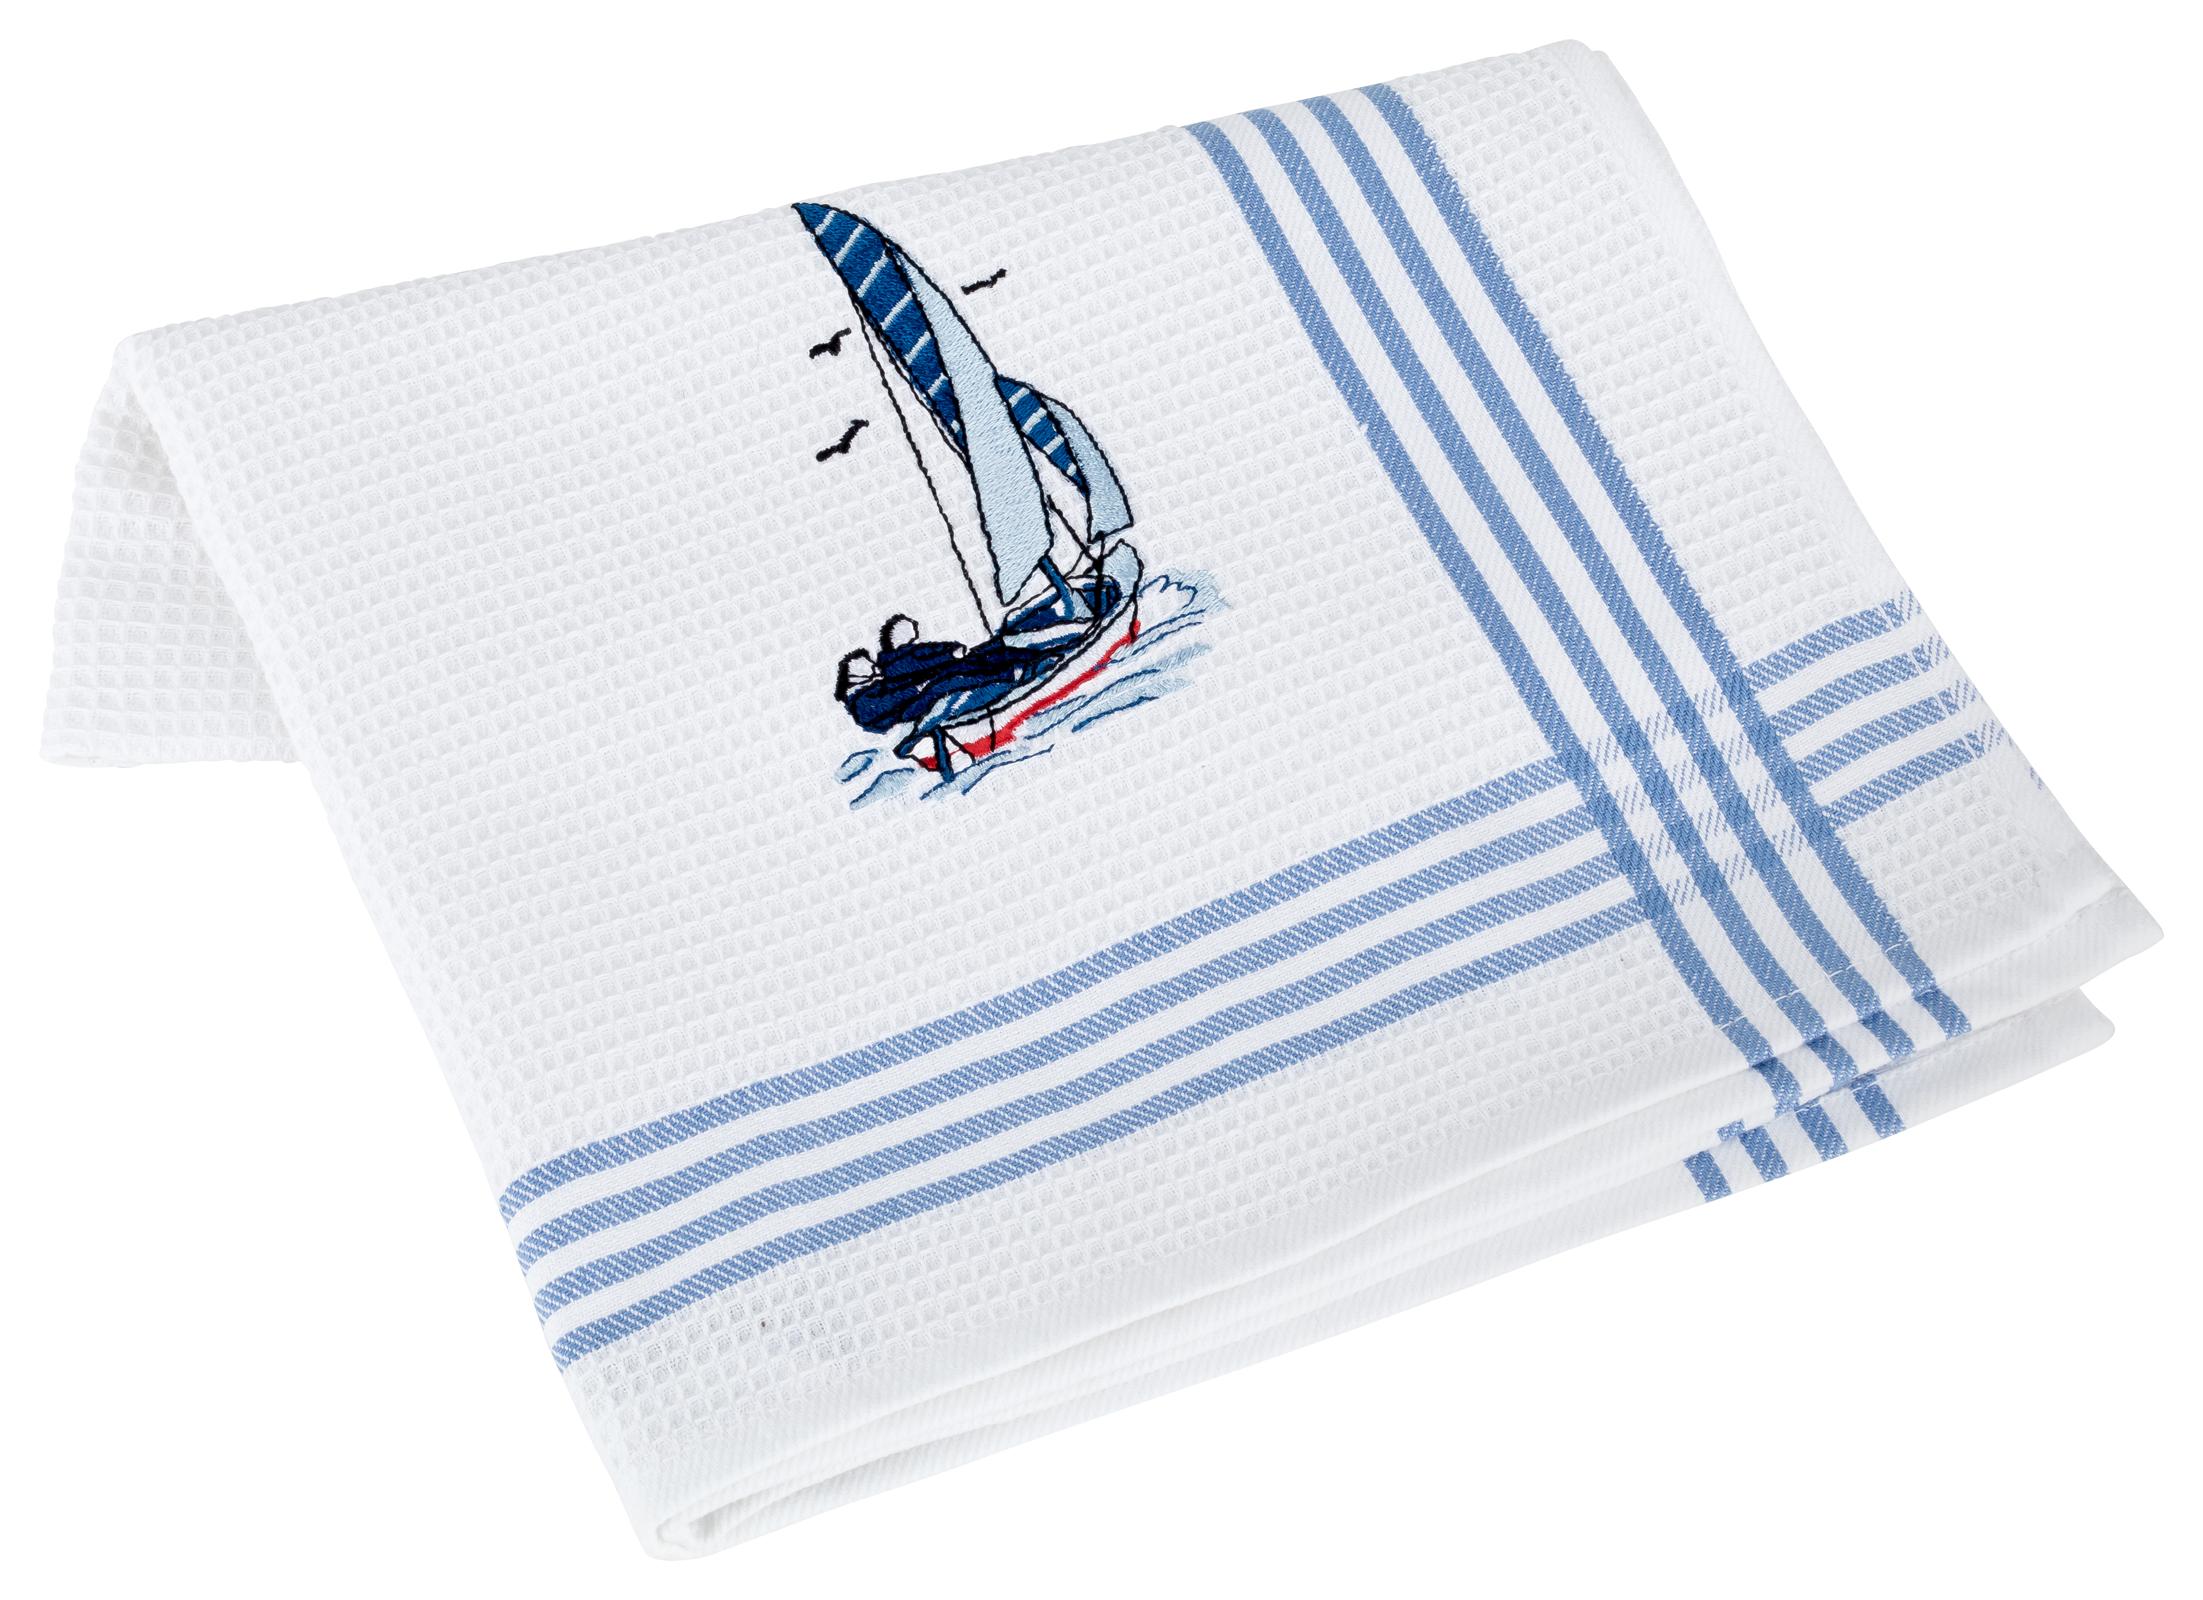 Küchentextilien - Kracht 2er Pack Geschirrtücher Küchenhandtuch Waffelpicquet 100 Baumwolle bestickt 4 412 00 Segelschiff  - Onlineshop PremiumShop321